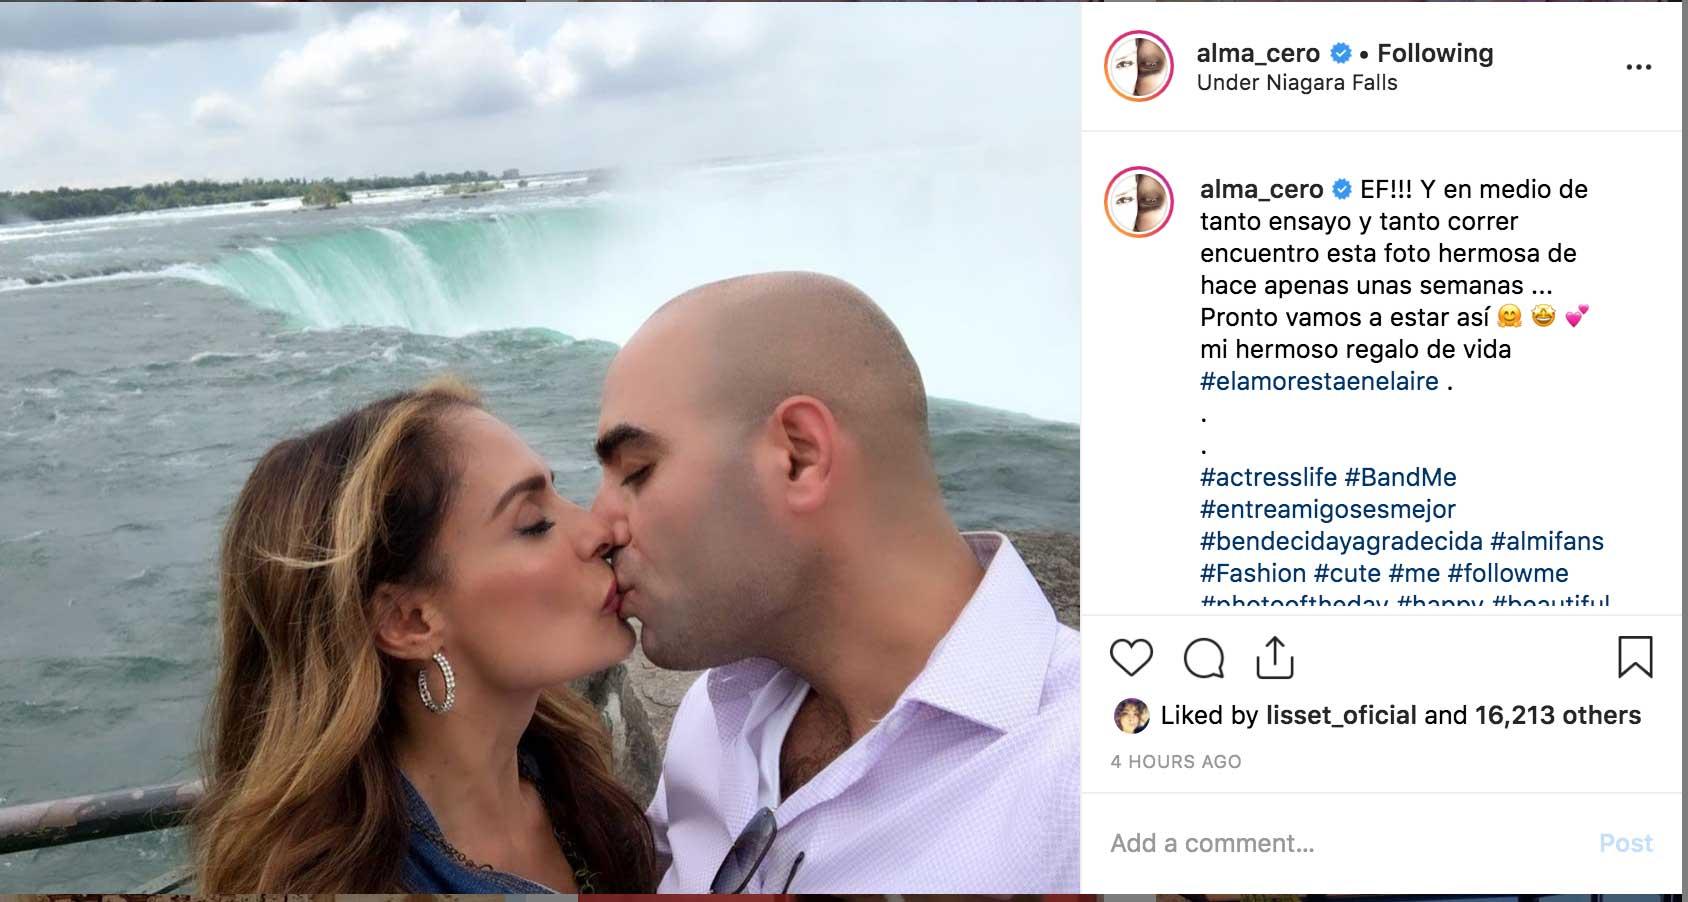 Alma Cero le restriega su nuevo amor a Edwin Luna